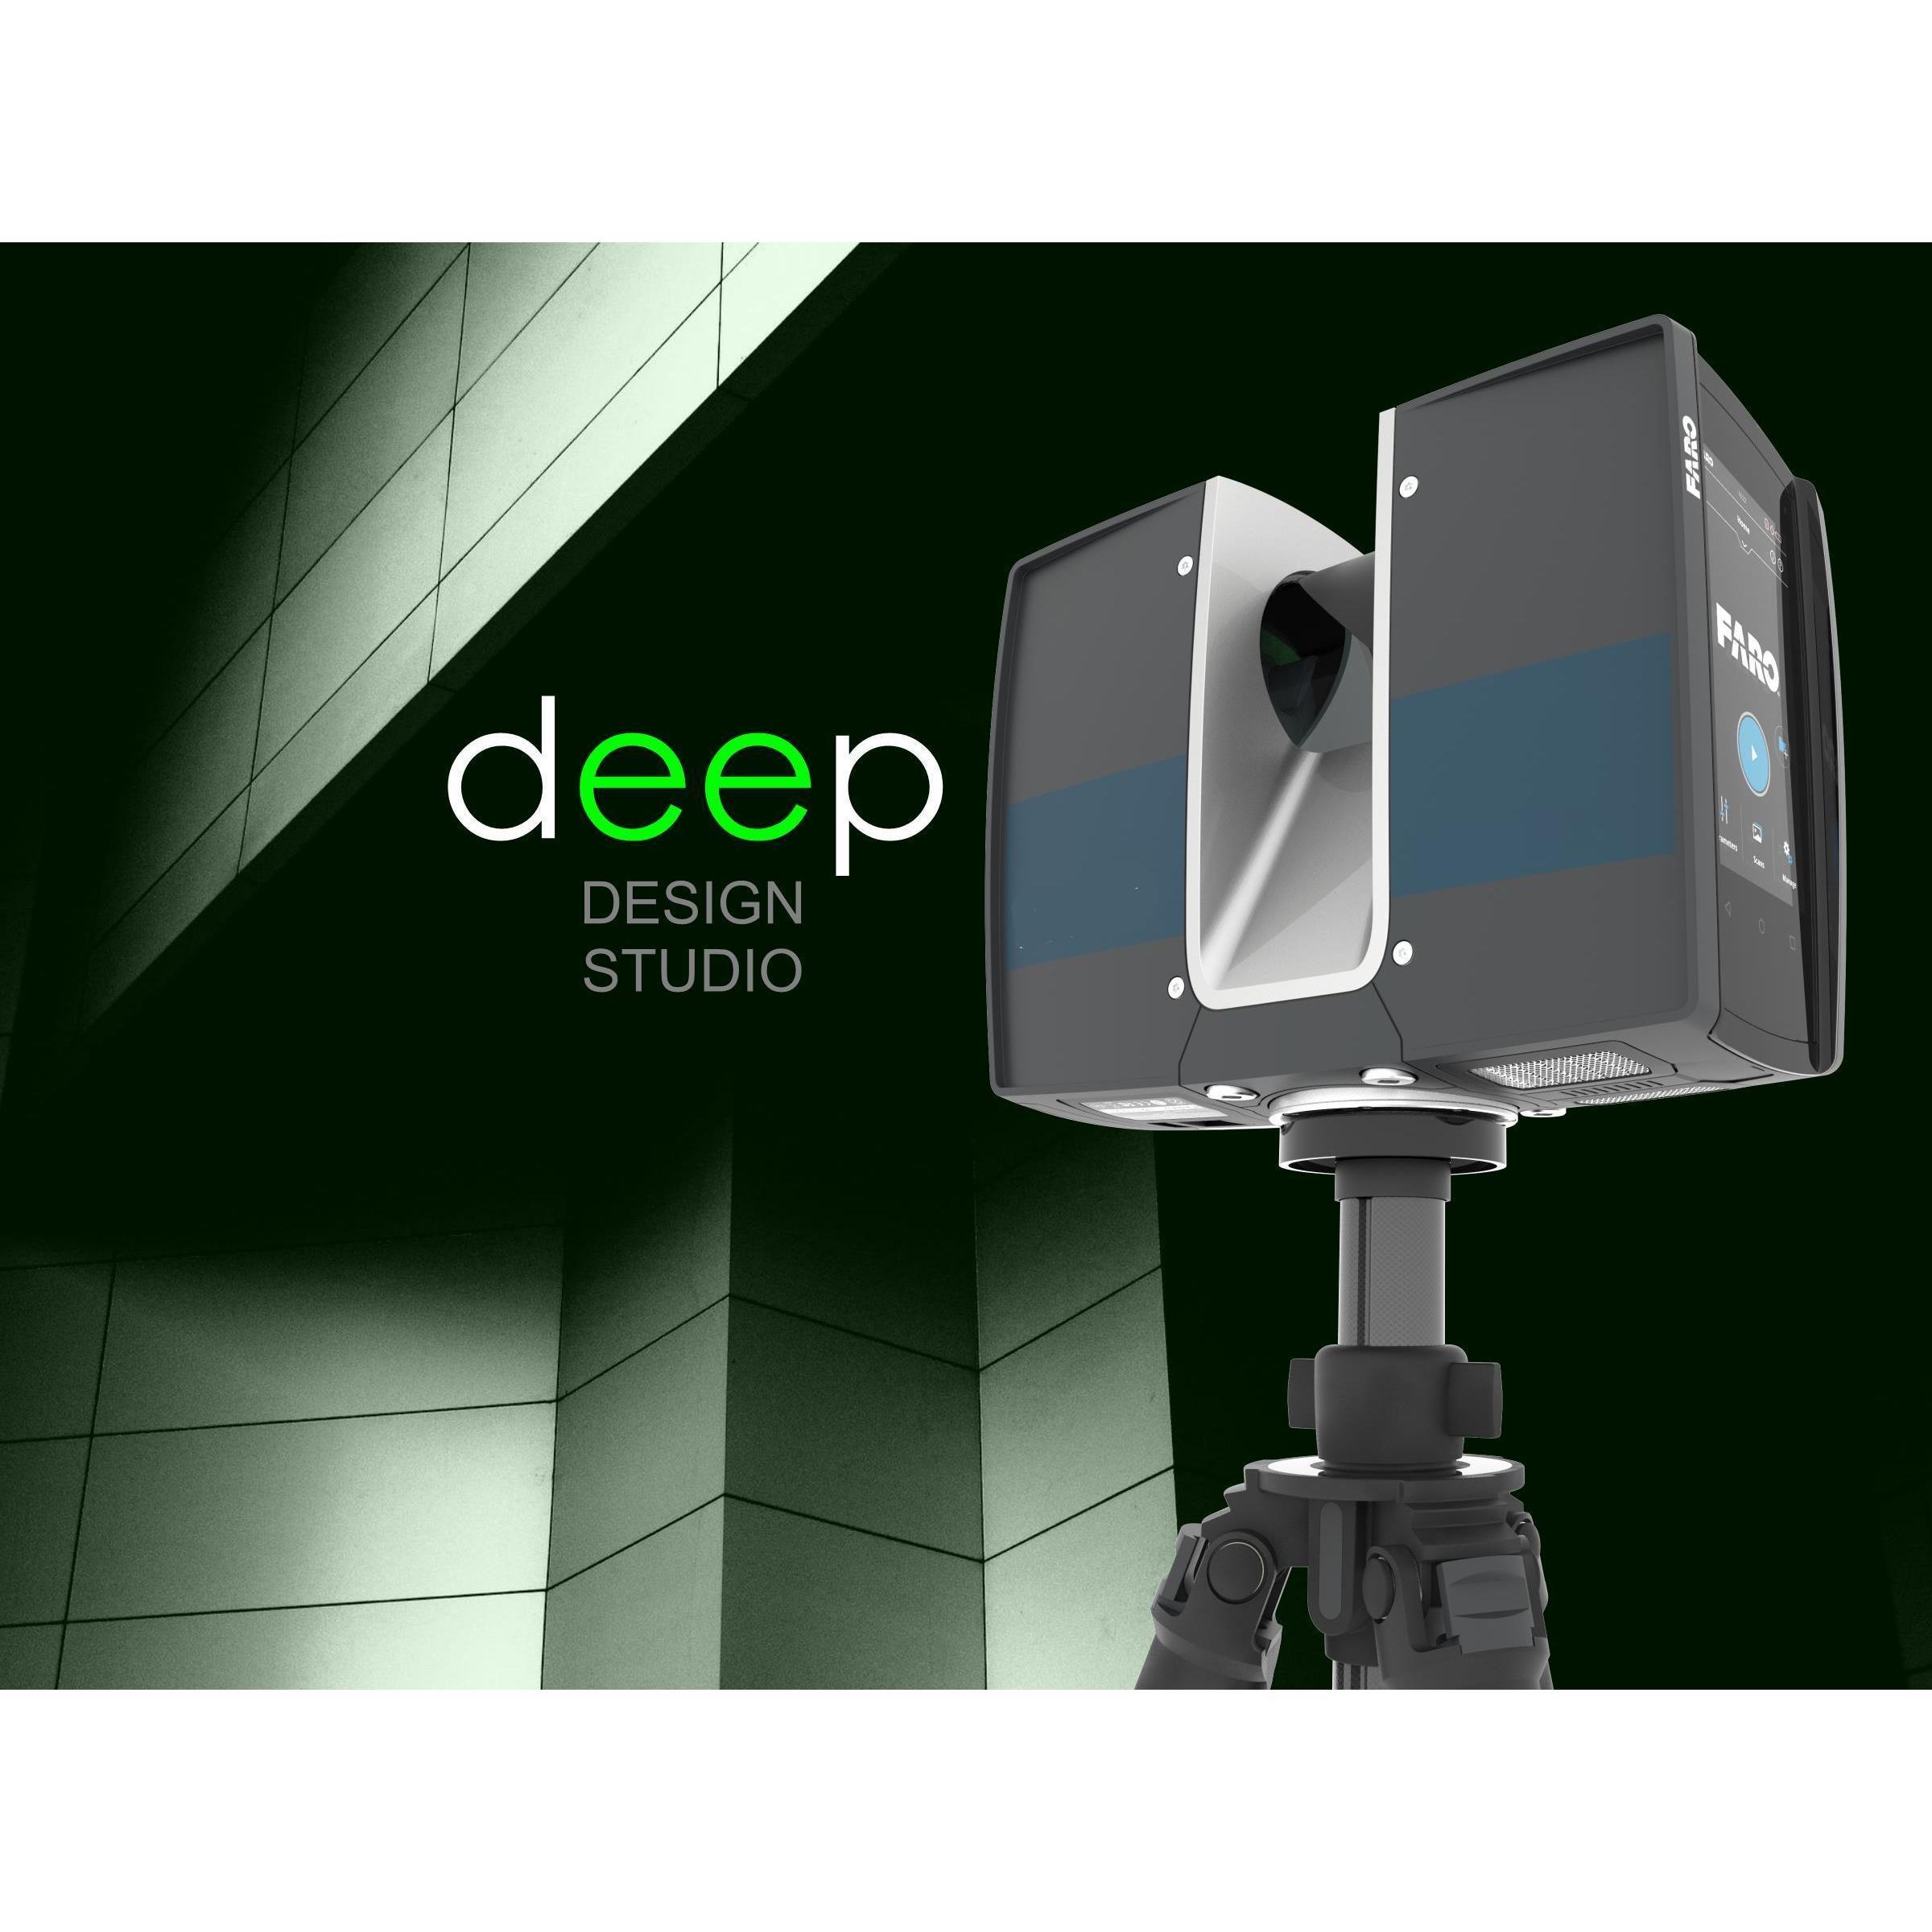 Deep Design Studio